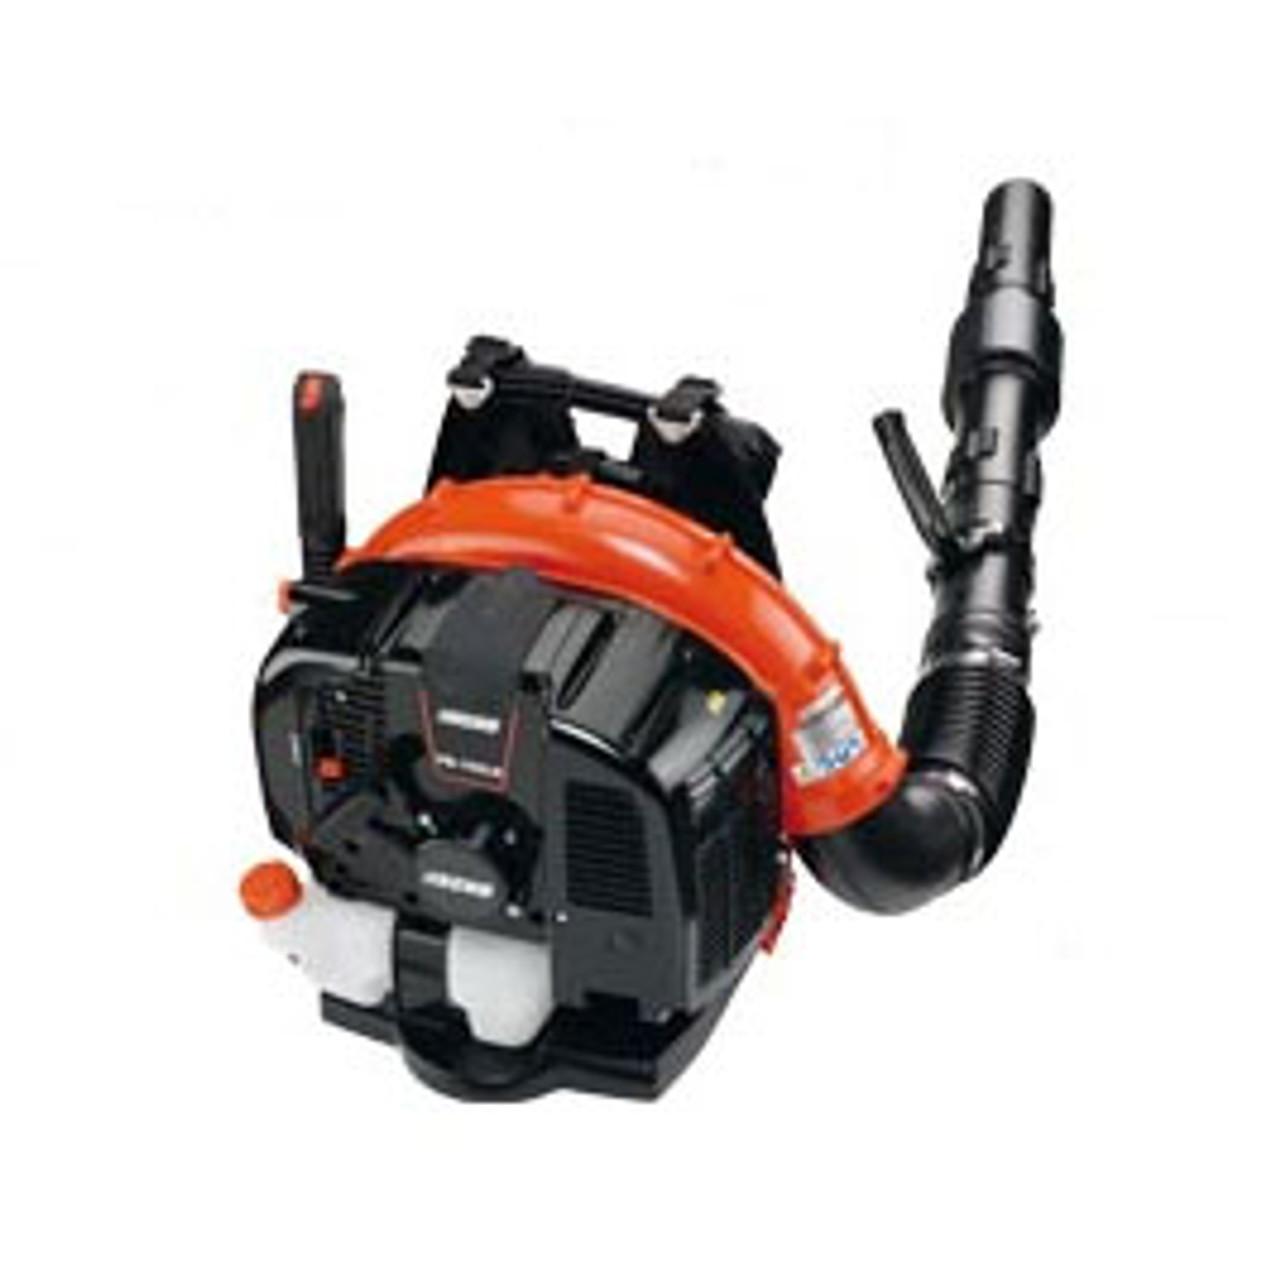 Echo Pb 760lnh 63 3 Cc Low Noise Gas Backpack Leaf Blower